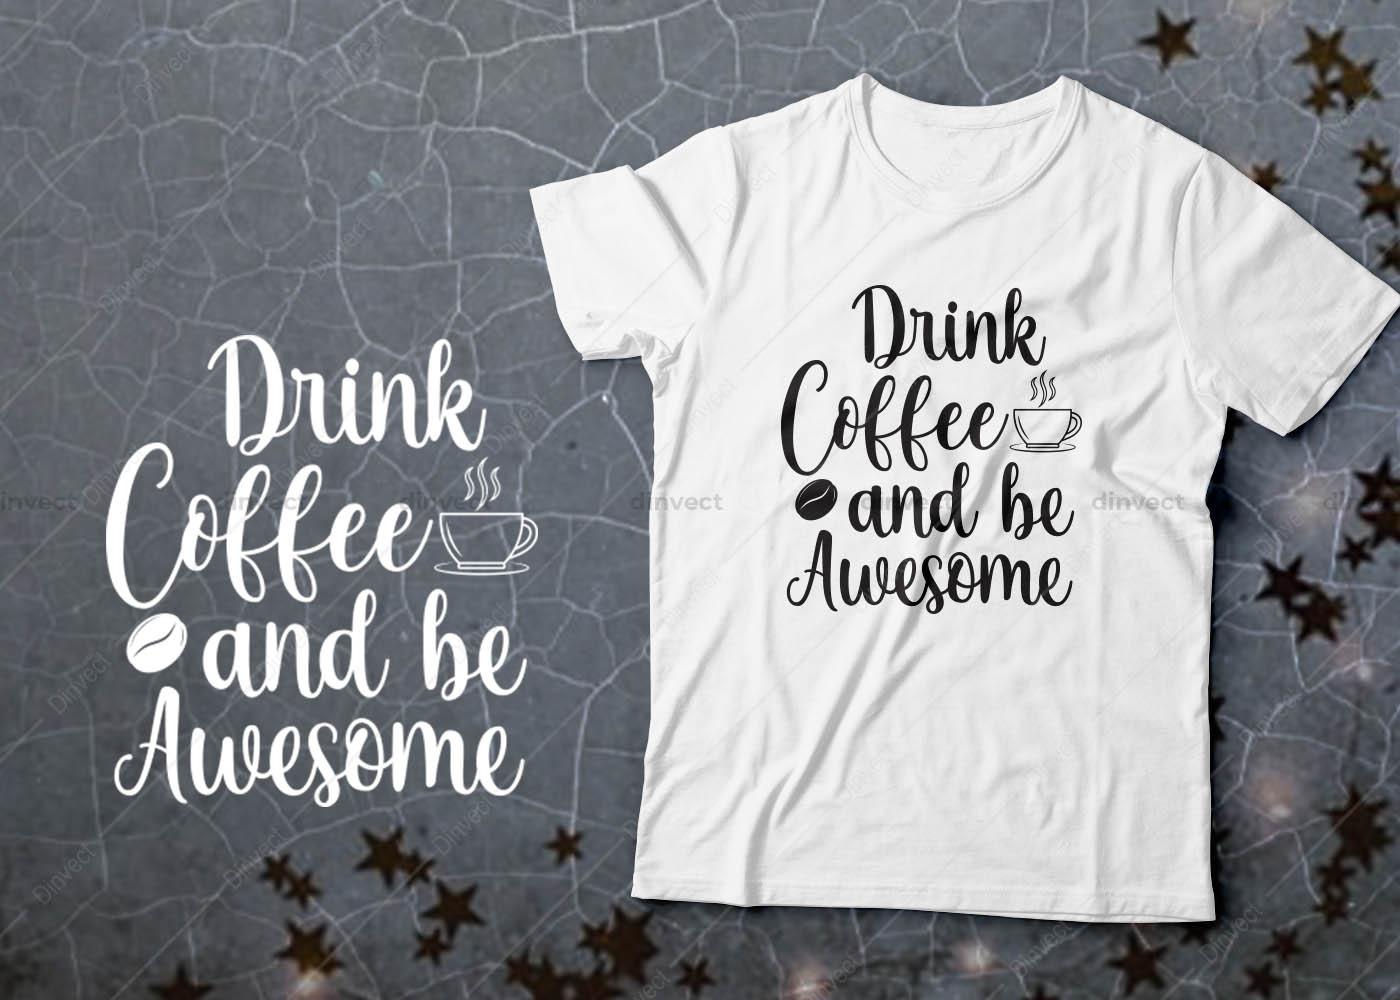 Coffee SVG, Coffee Bundle Svg, Coffee Mug Svg, Funny Coffee Quotes SVG, Mug Design Svg, Coffee Quote - Coffee 7 -